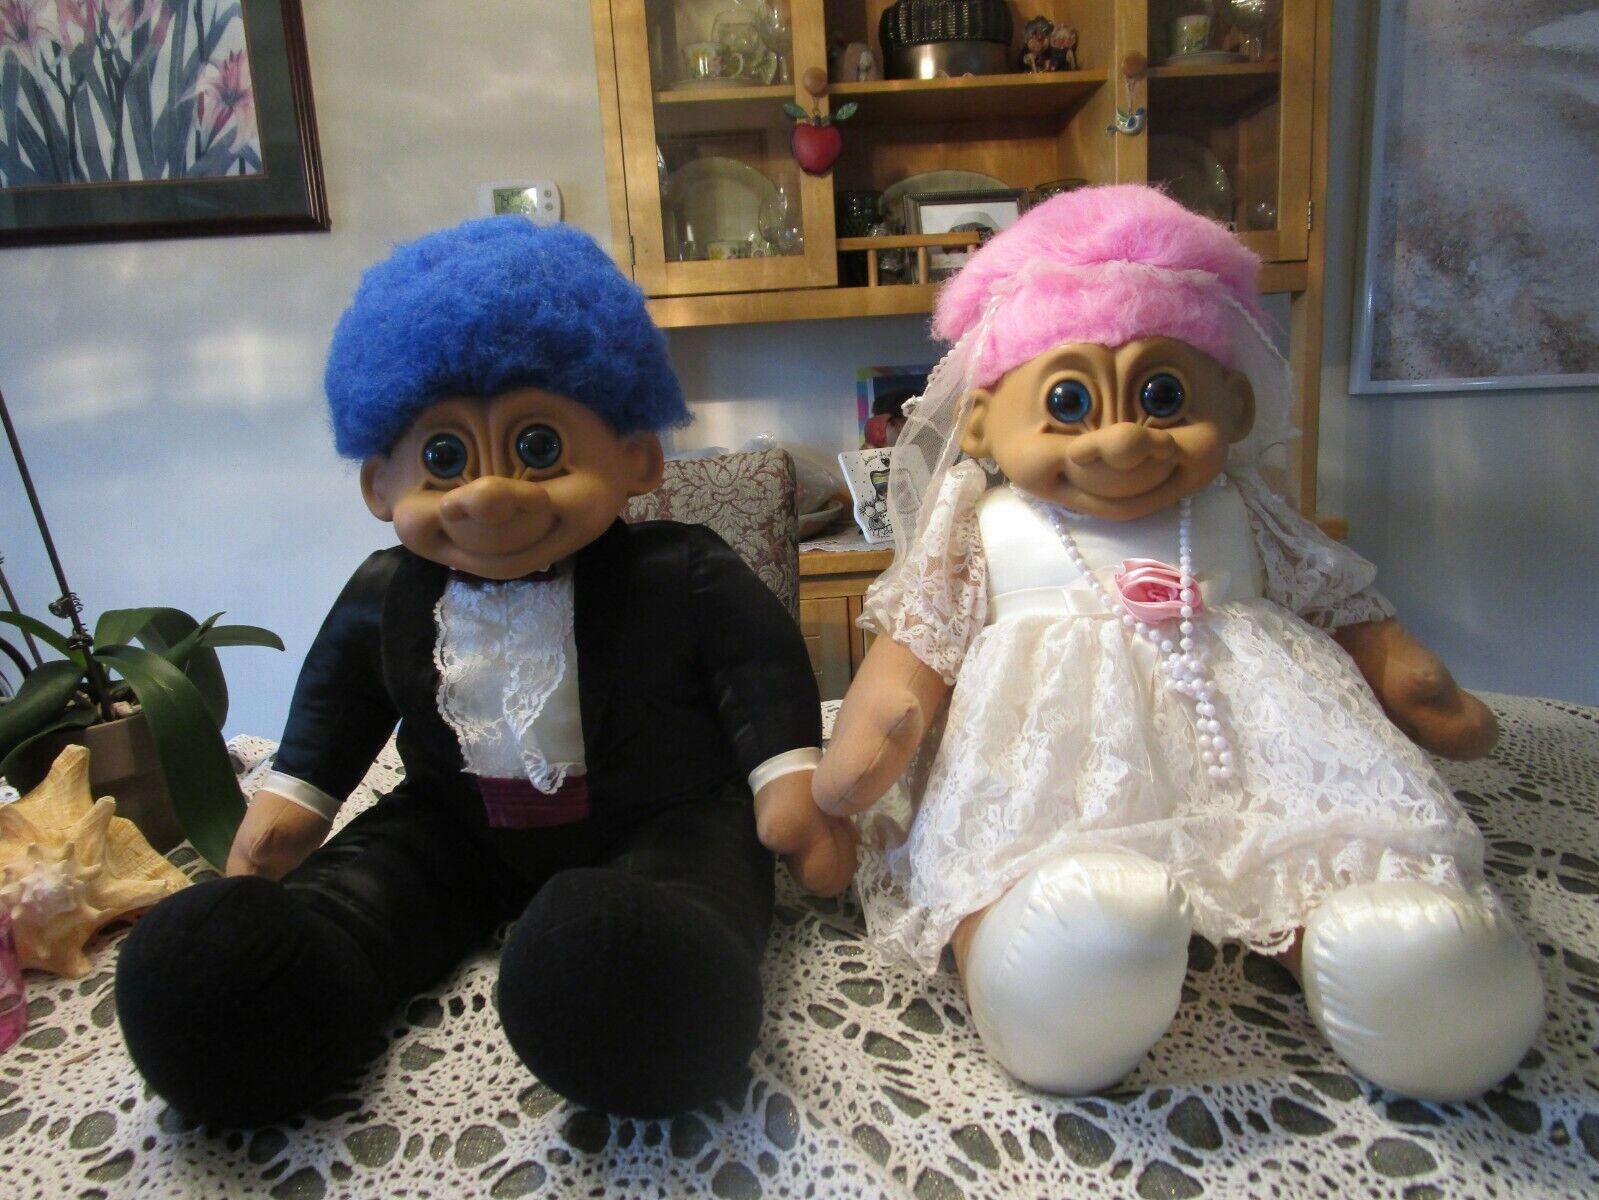 GIANT RUSS BRIDE & GROOM - 22 -24  Russ Troll Dolls - Rare